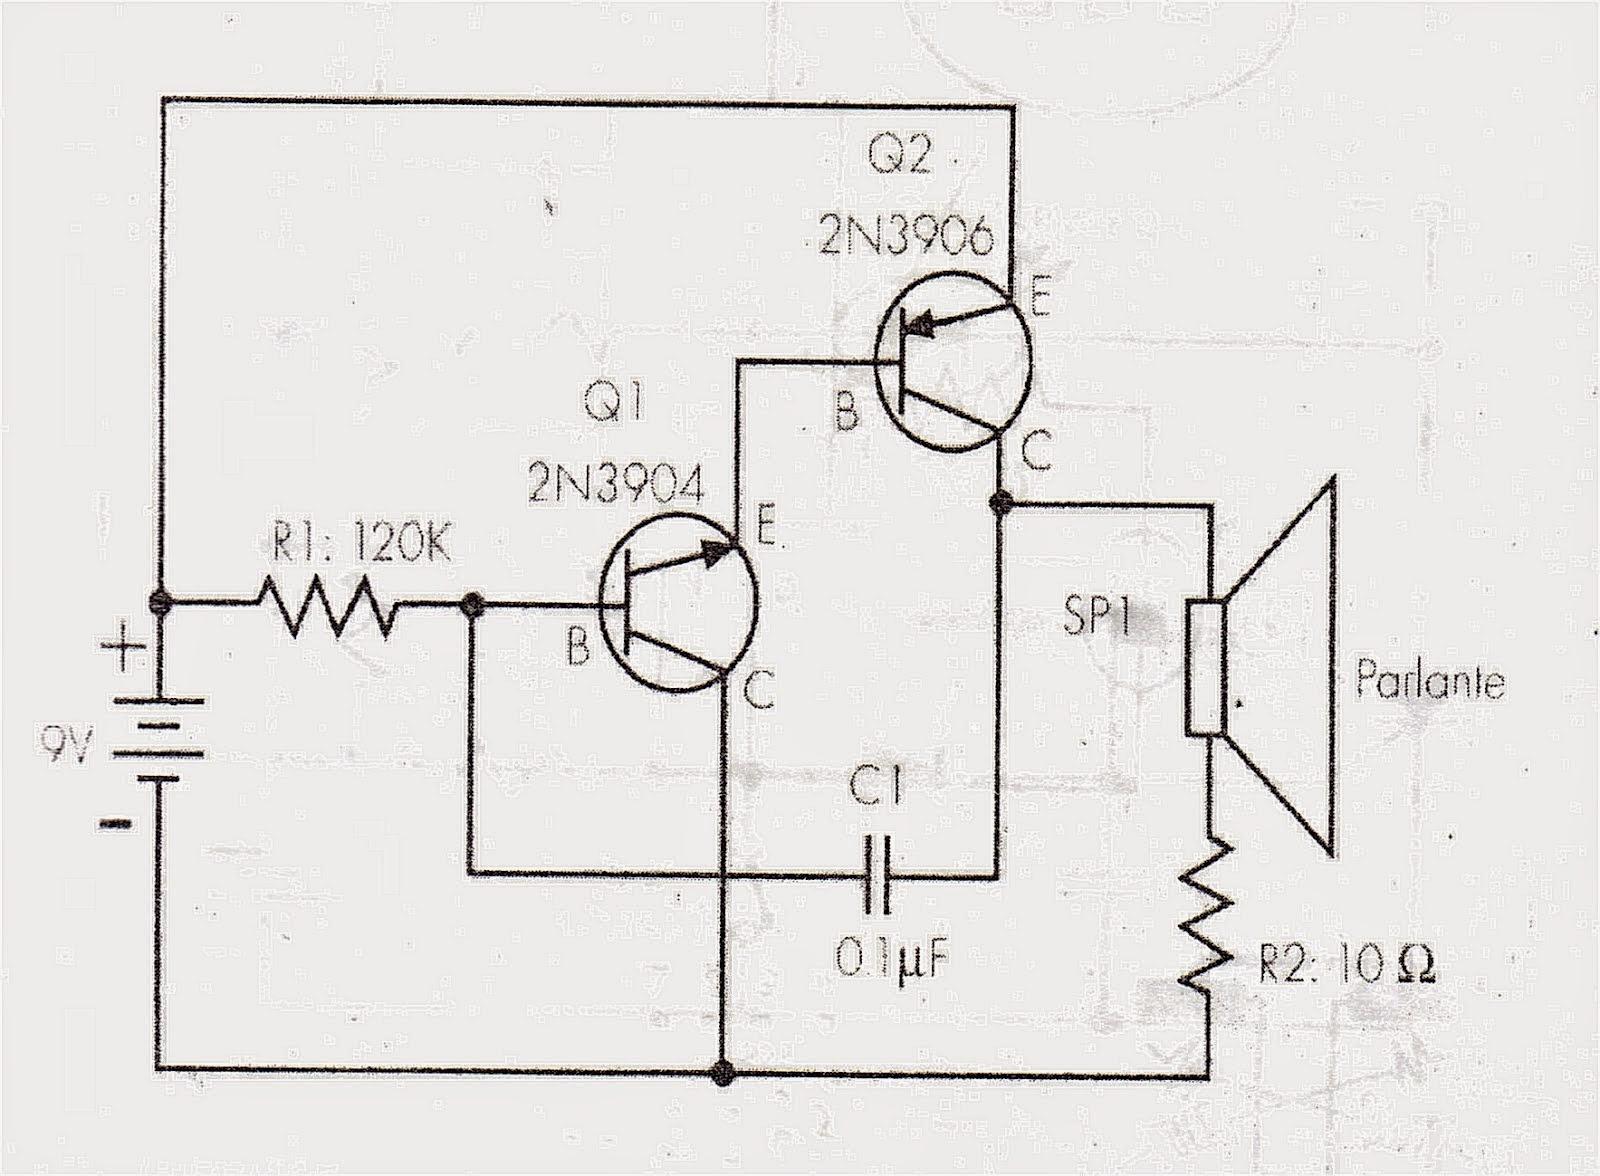 Circuito Transistor : Electronica para dummies: transistor como oscilador